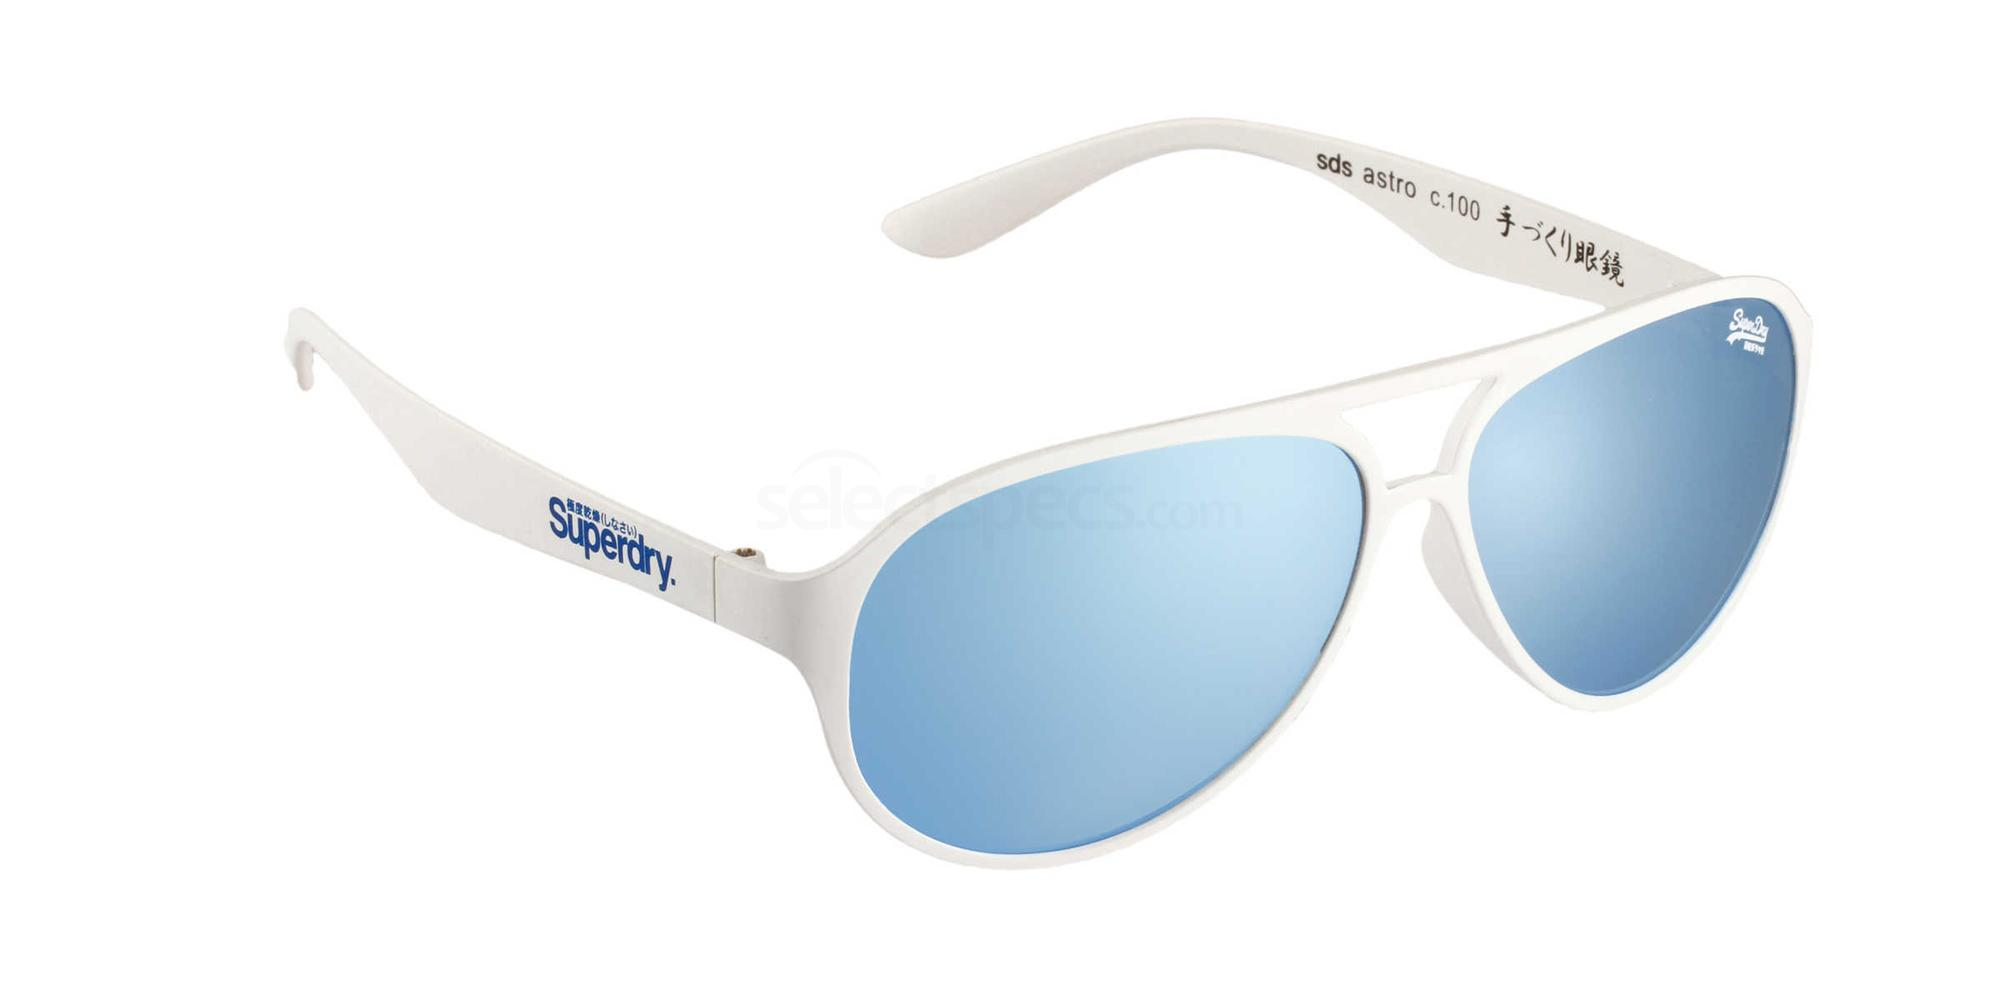 100 SDS-ASTRO Sunglasses, Superdry